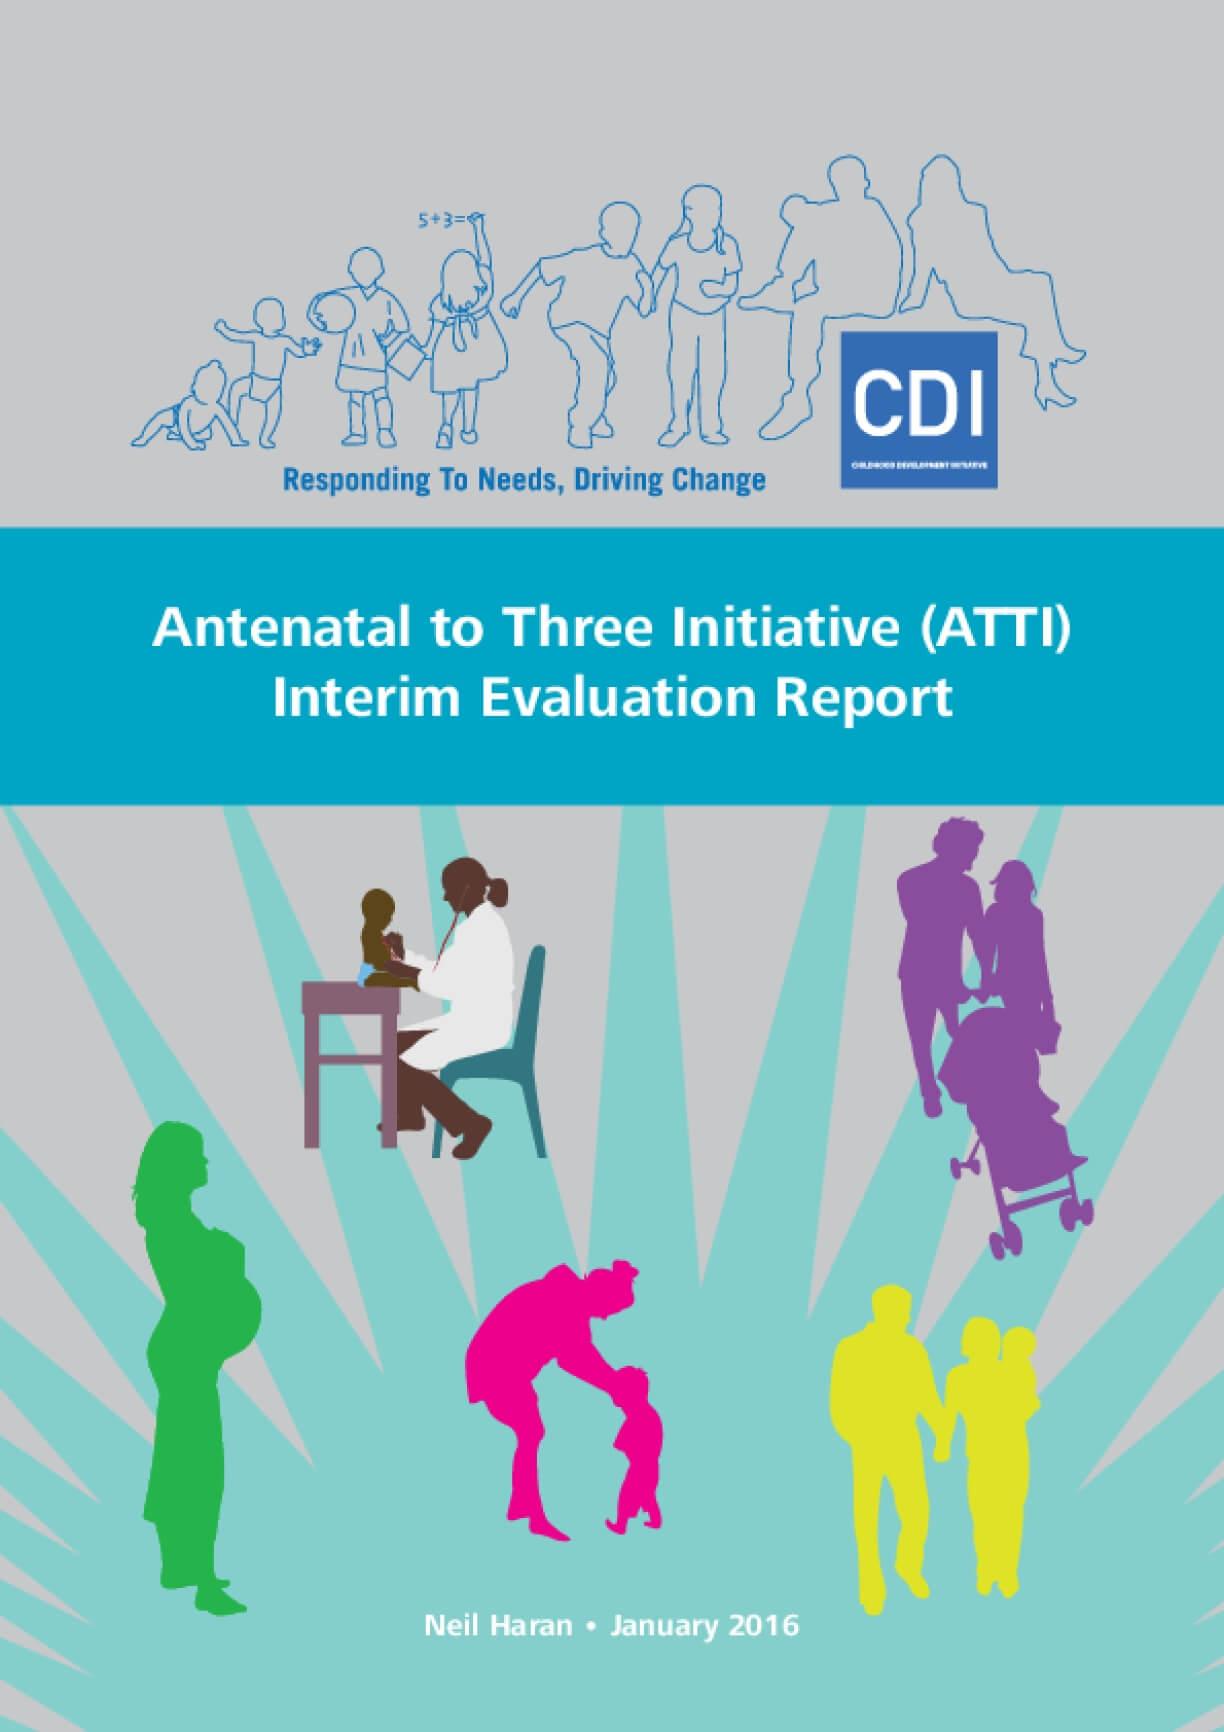 Antenatal to Three Initiative (ATTI) Interim Evaluation Report